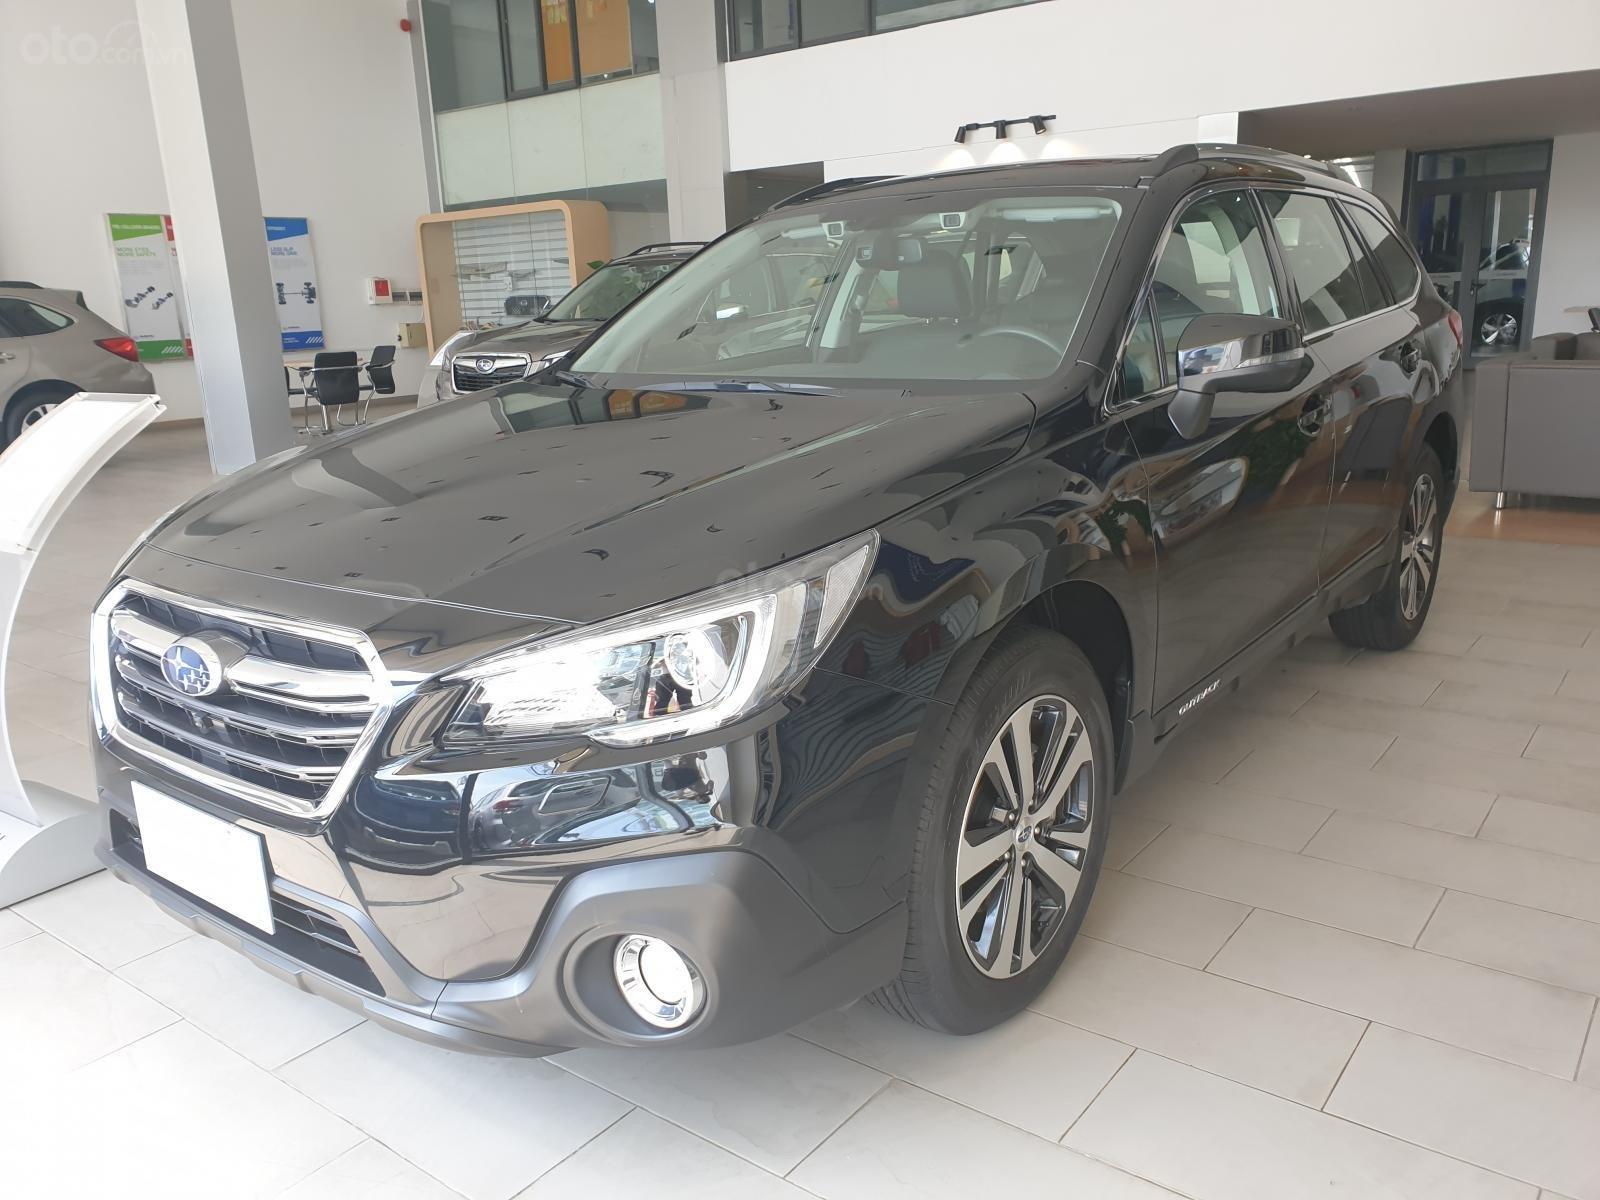 Bán Subaru Outback 2.5i-S EyeSight, nhập khẩu Nhật Bản 100% (6)